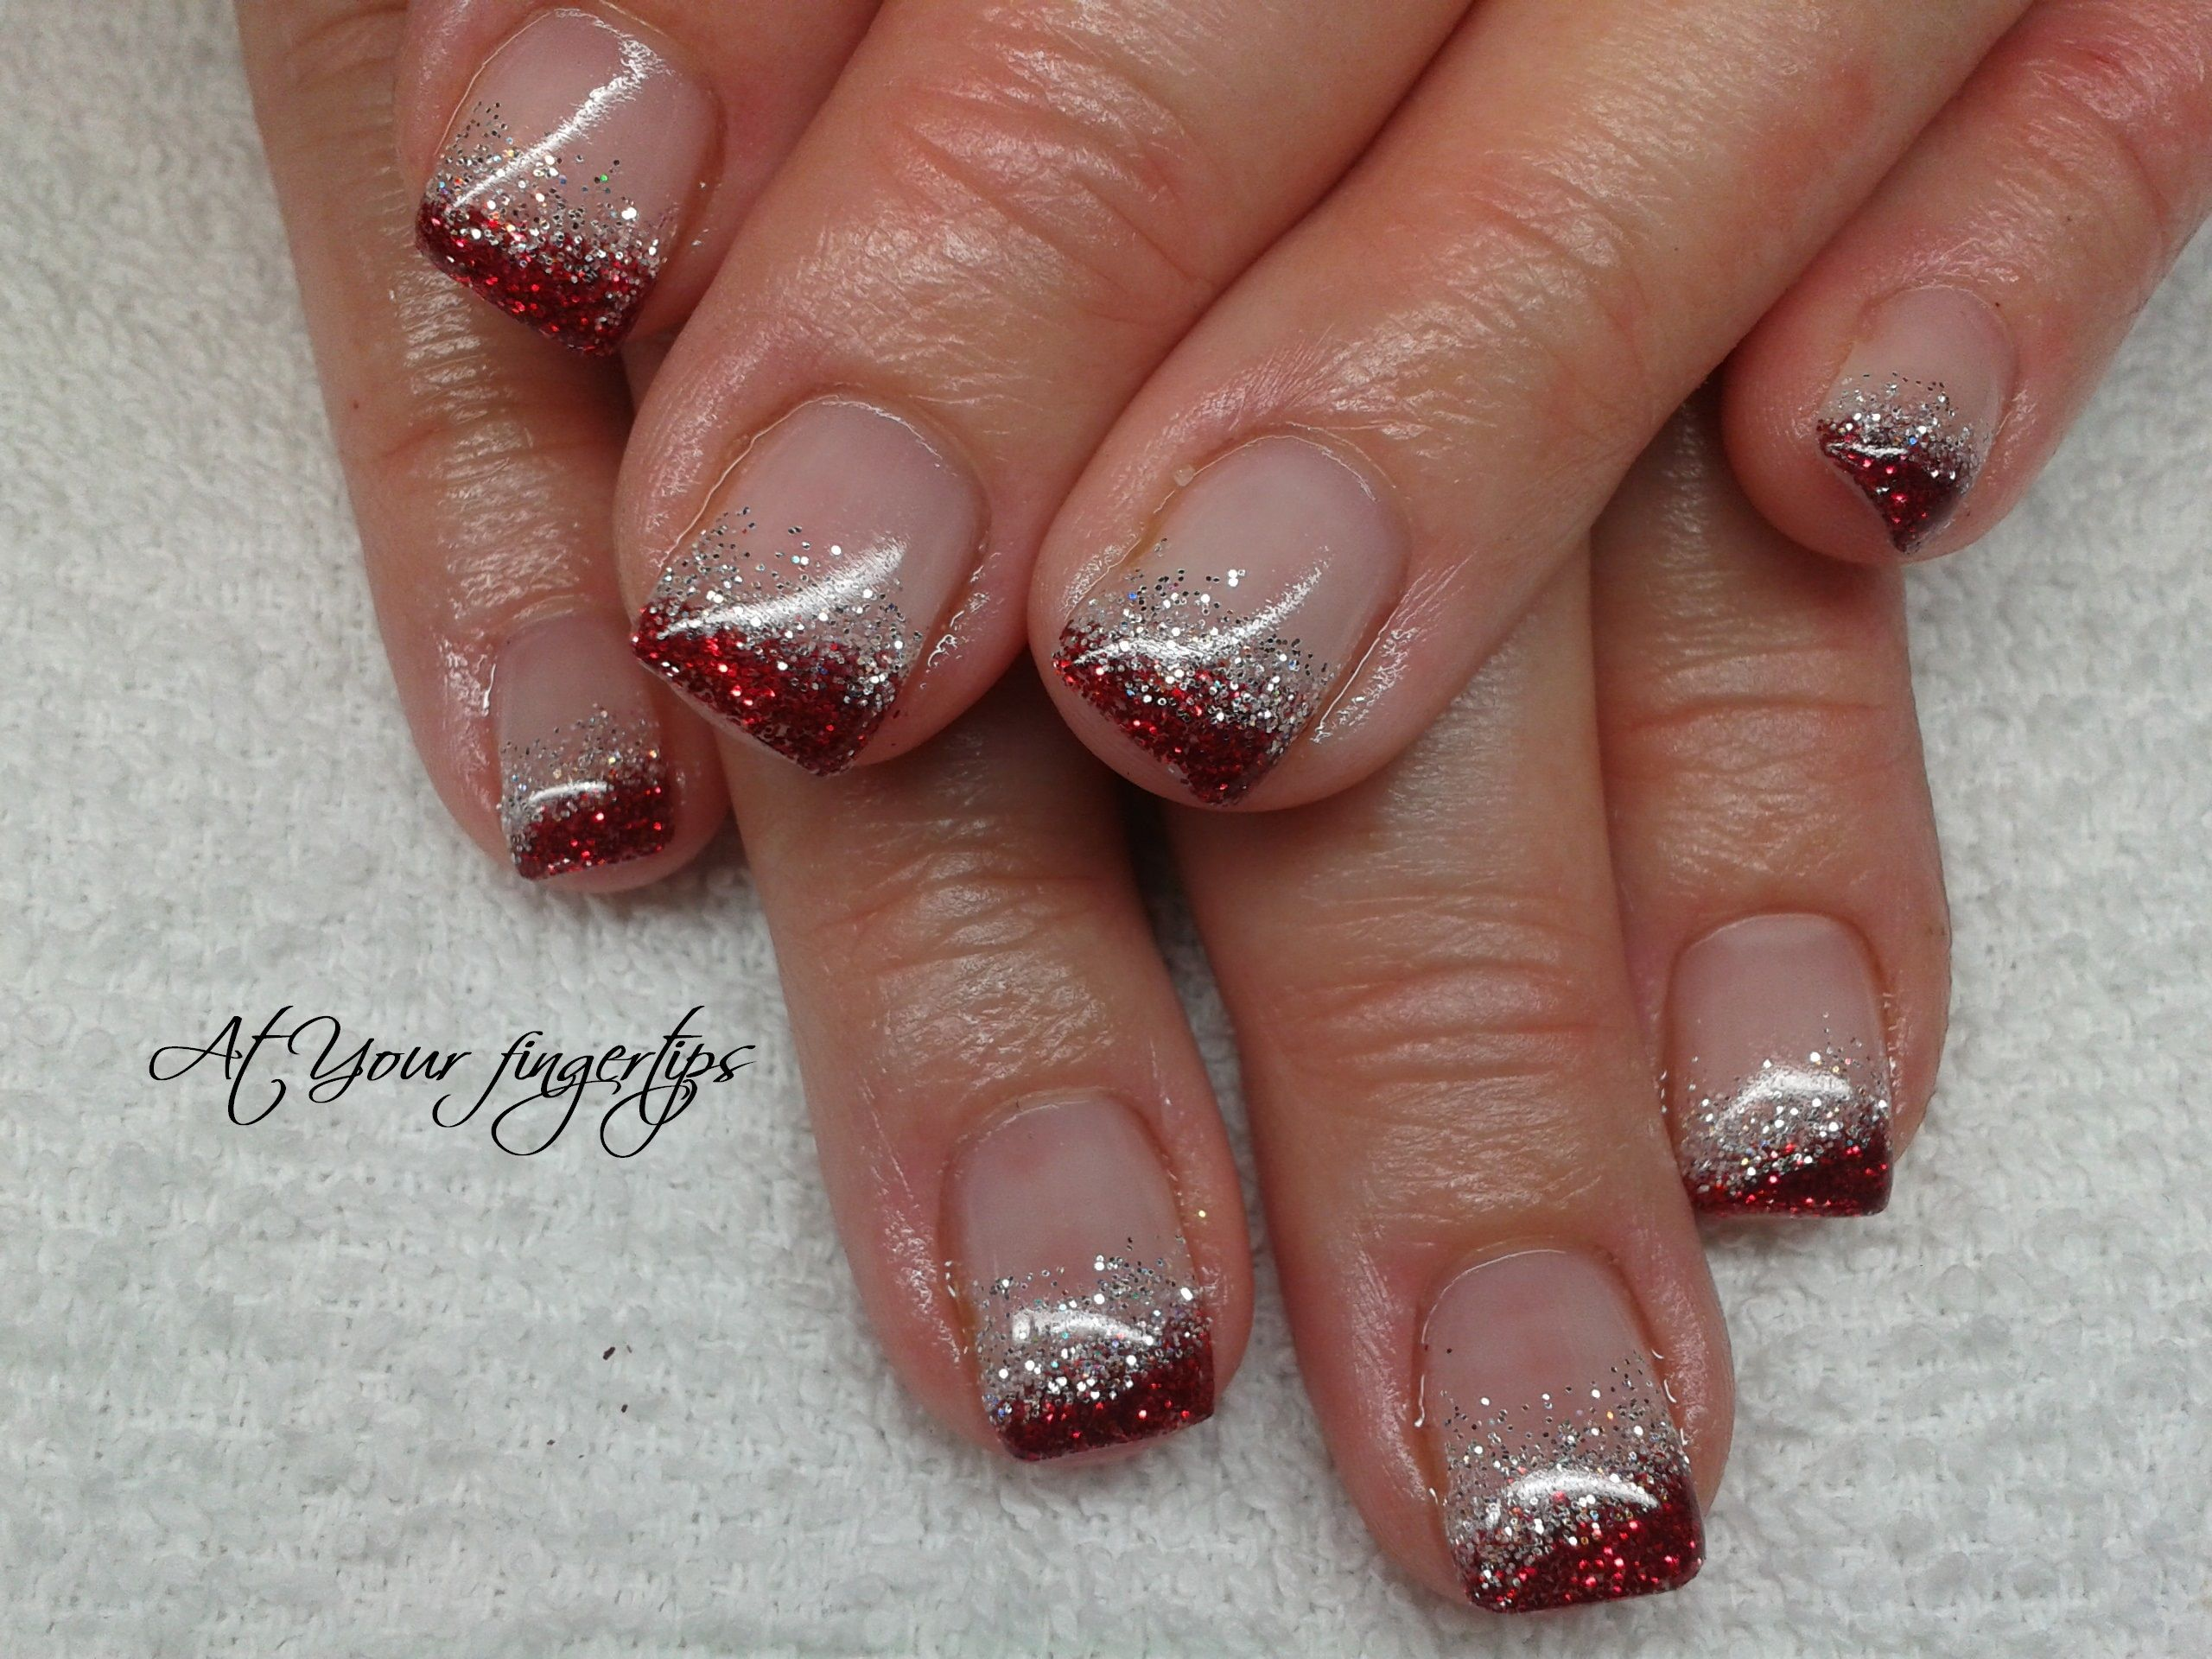 gel nails | Hair & Beauty | Pinterest